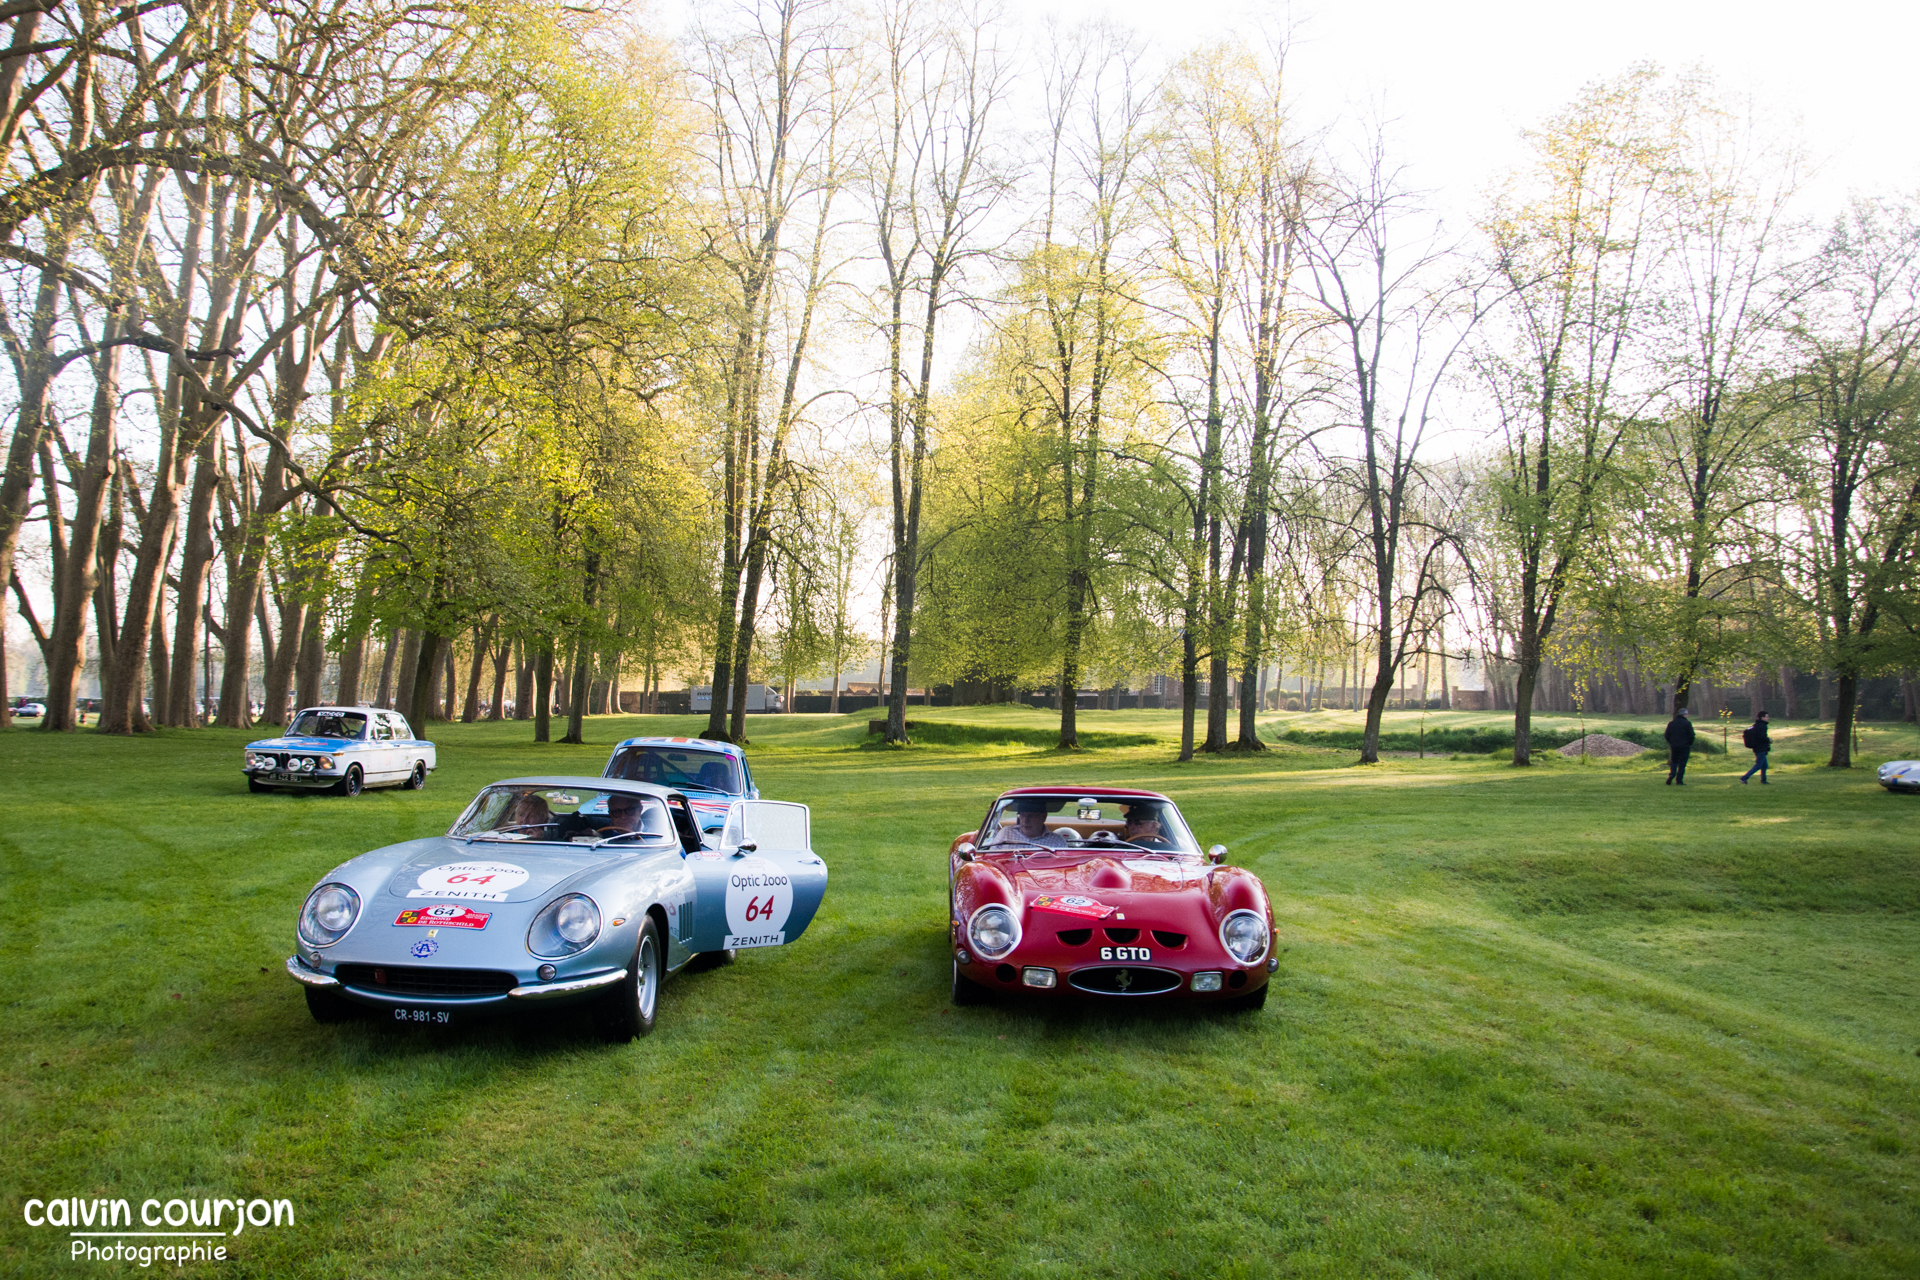 Ferrari 275 GTB (bleue) et Ferrari 250 GTO (rouge) - Tour Auto 2015 - Calvin Courjon Photographie